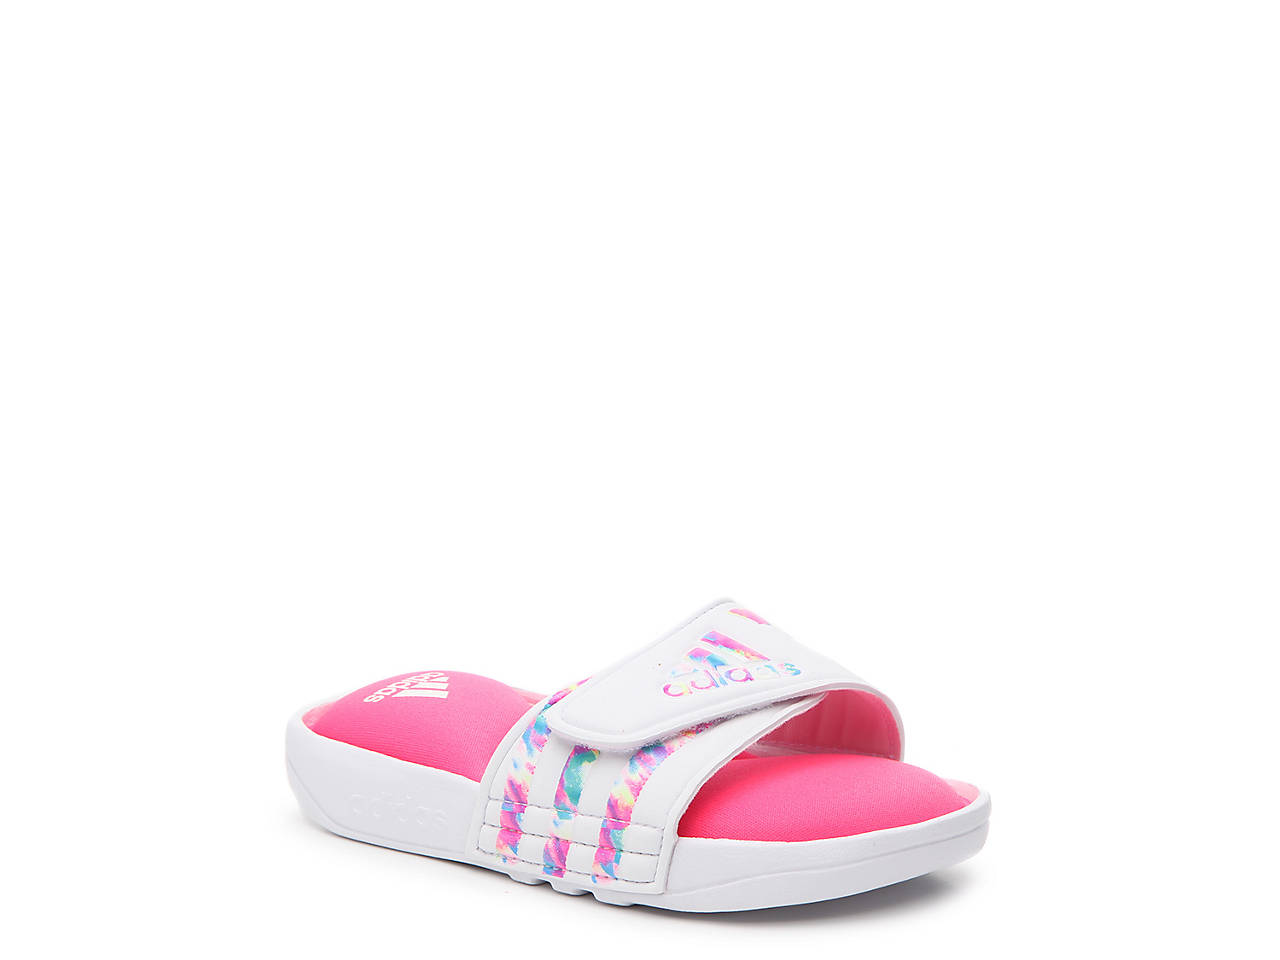 0debde111f32b adidas Adissage K Toddler   Youth Slide Sandal Kids Shoes